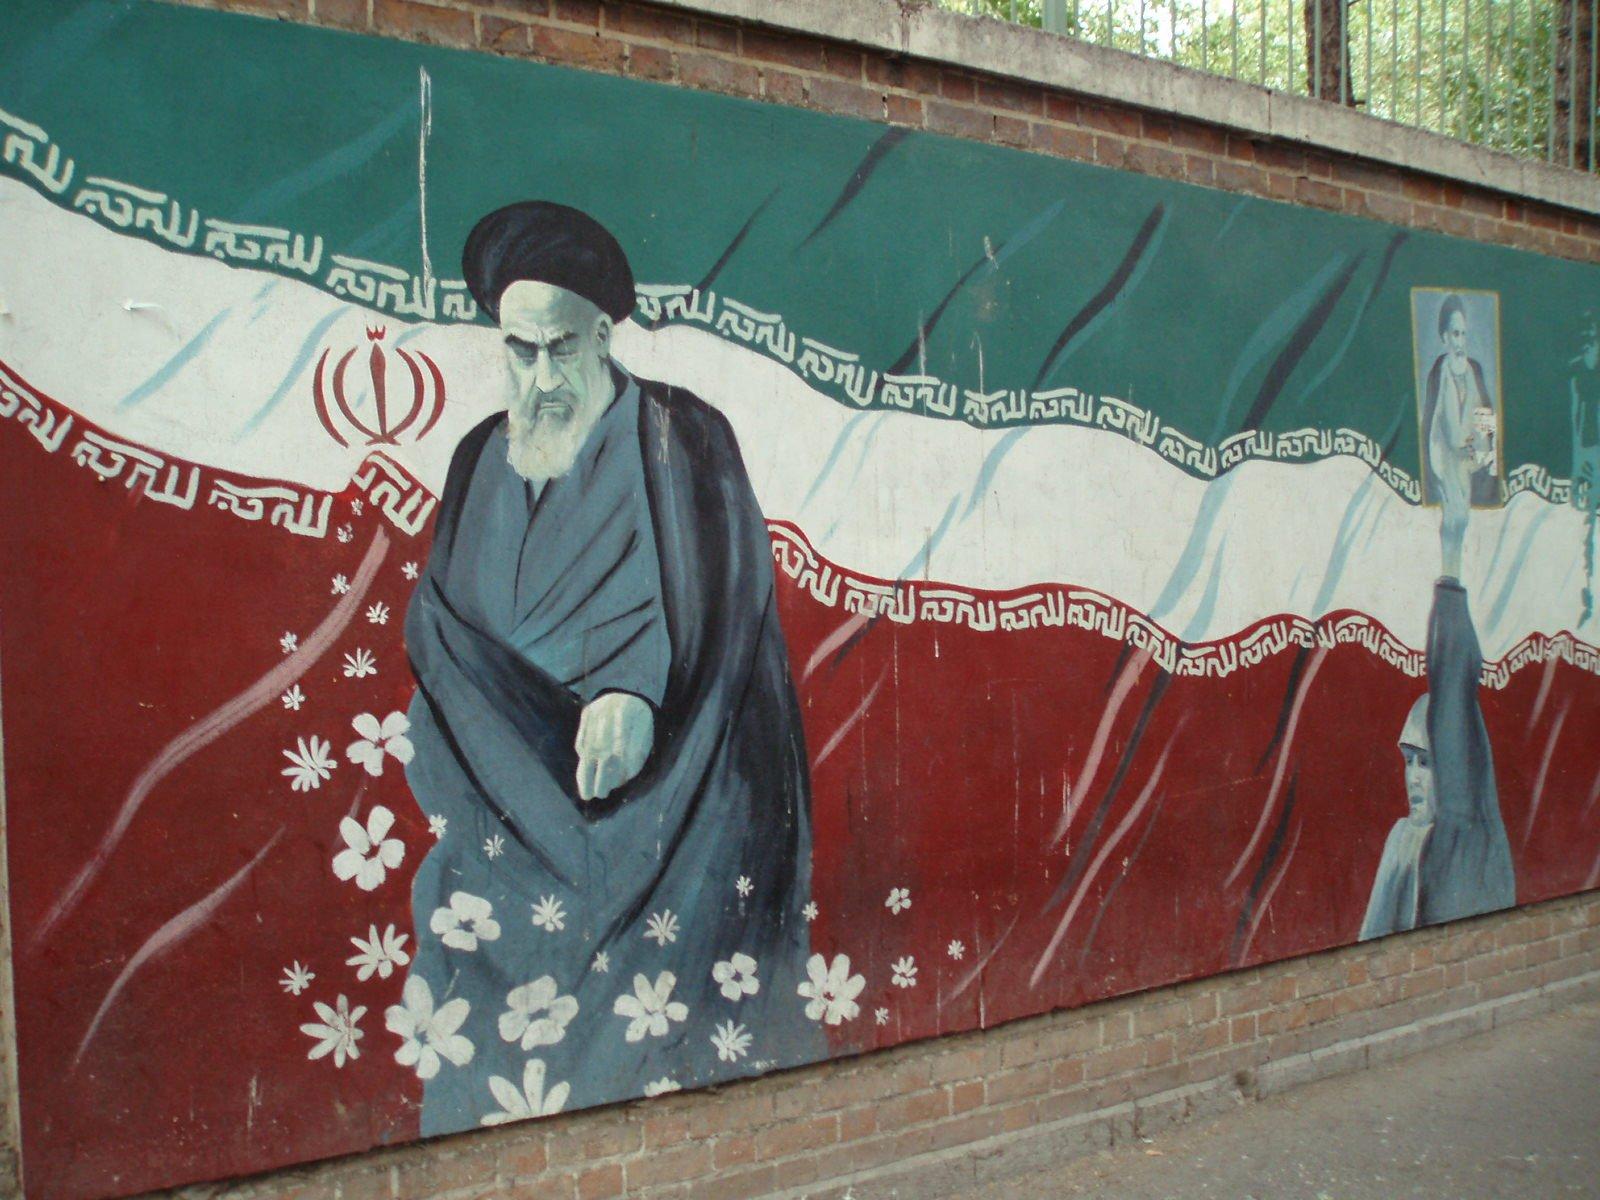 Panel Mulls Middle East Dynamics After Soleimani Death - USNI News